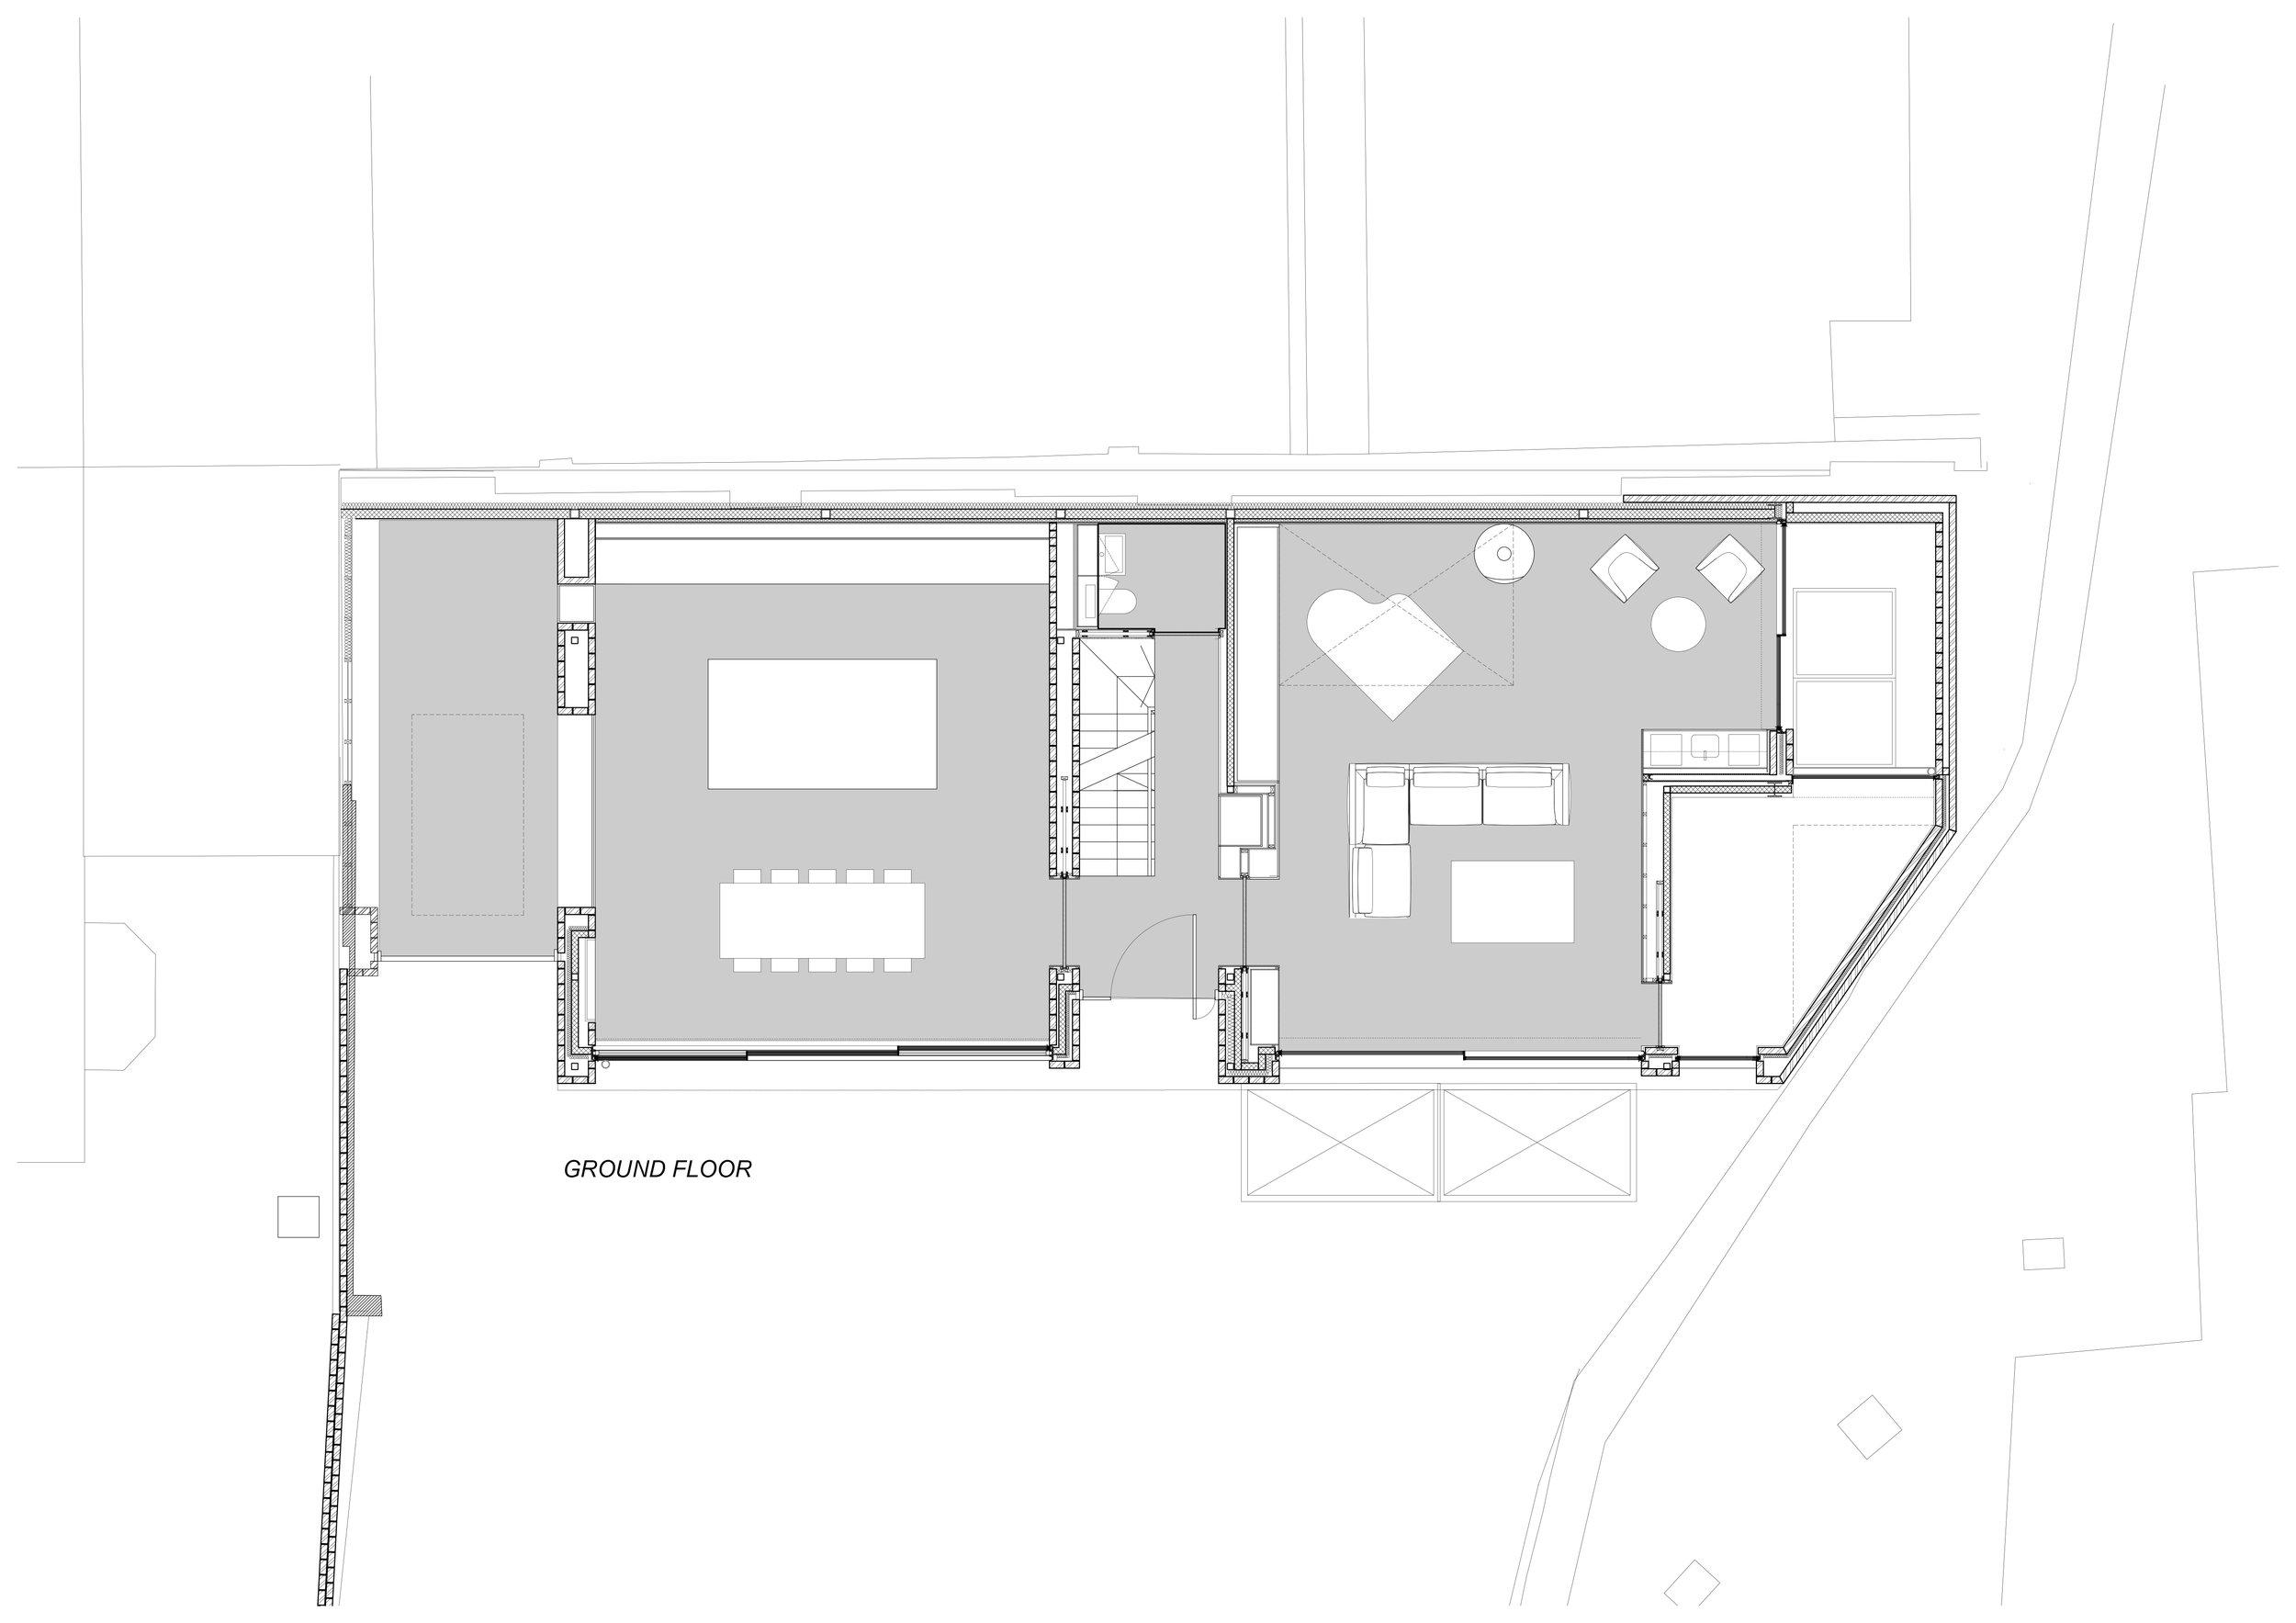 Sergison Proposed Plans - WEB OPTIMIZED GF PLAN.jpg